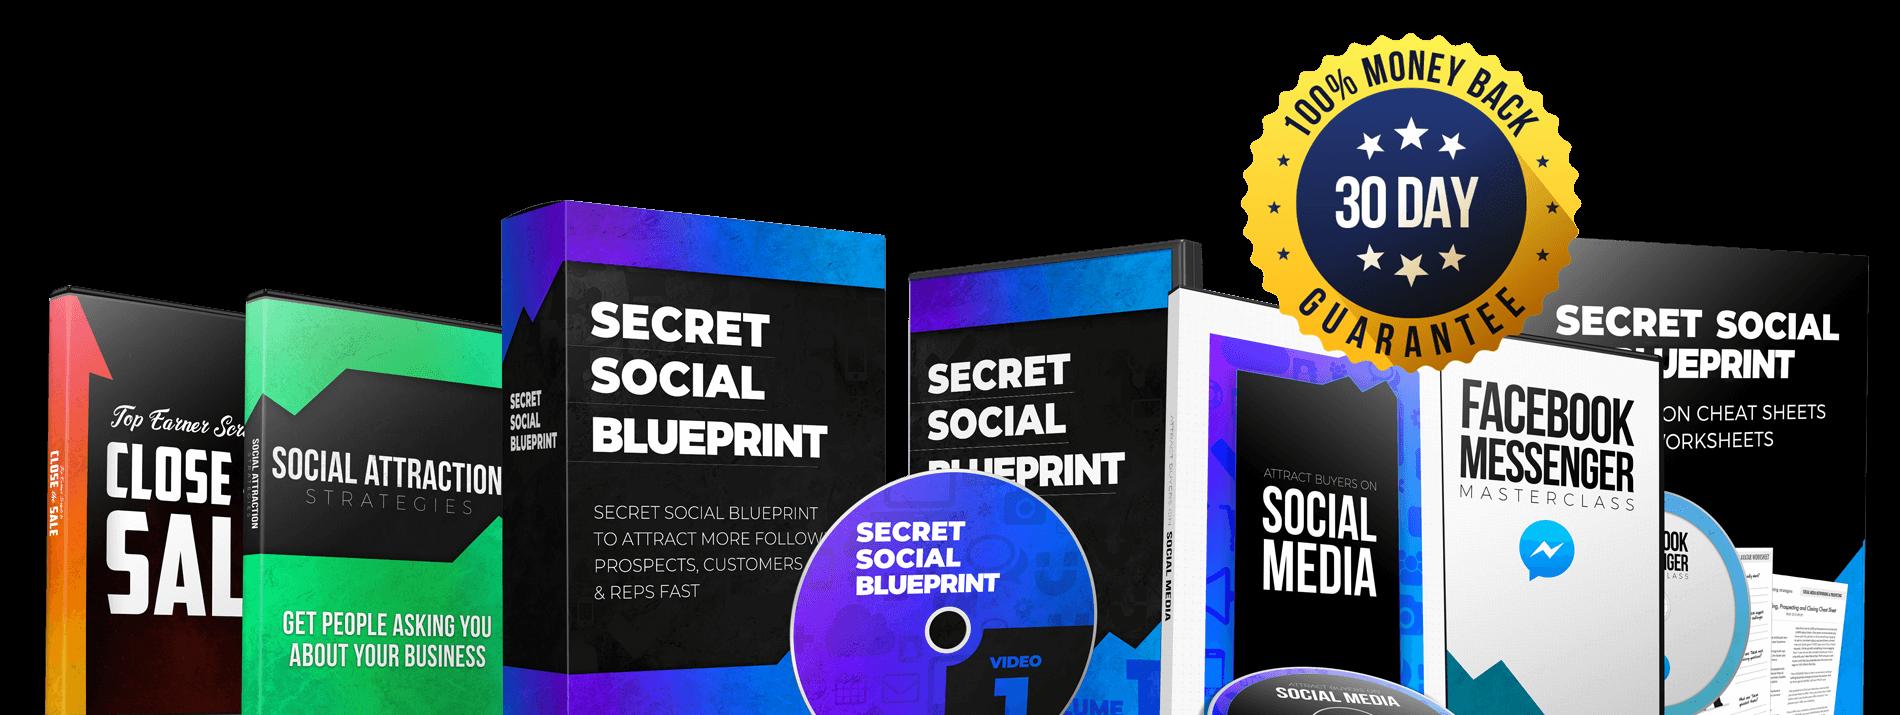 Secret Social Blueprint